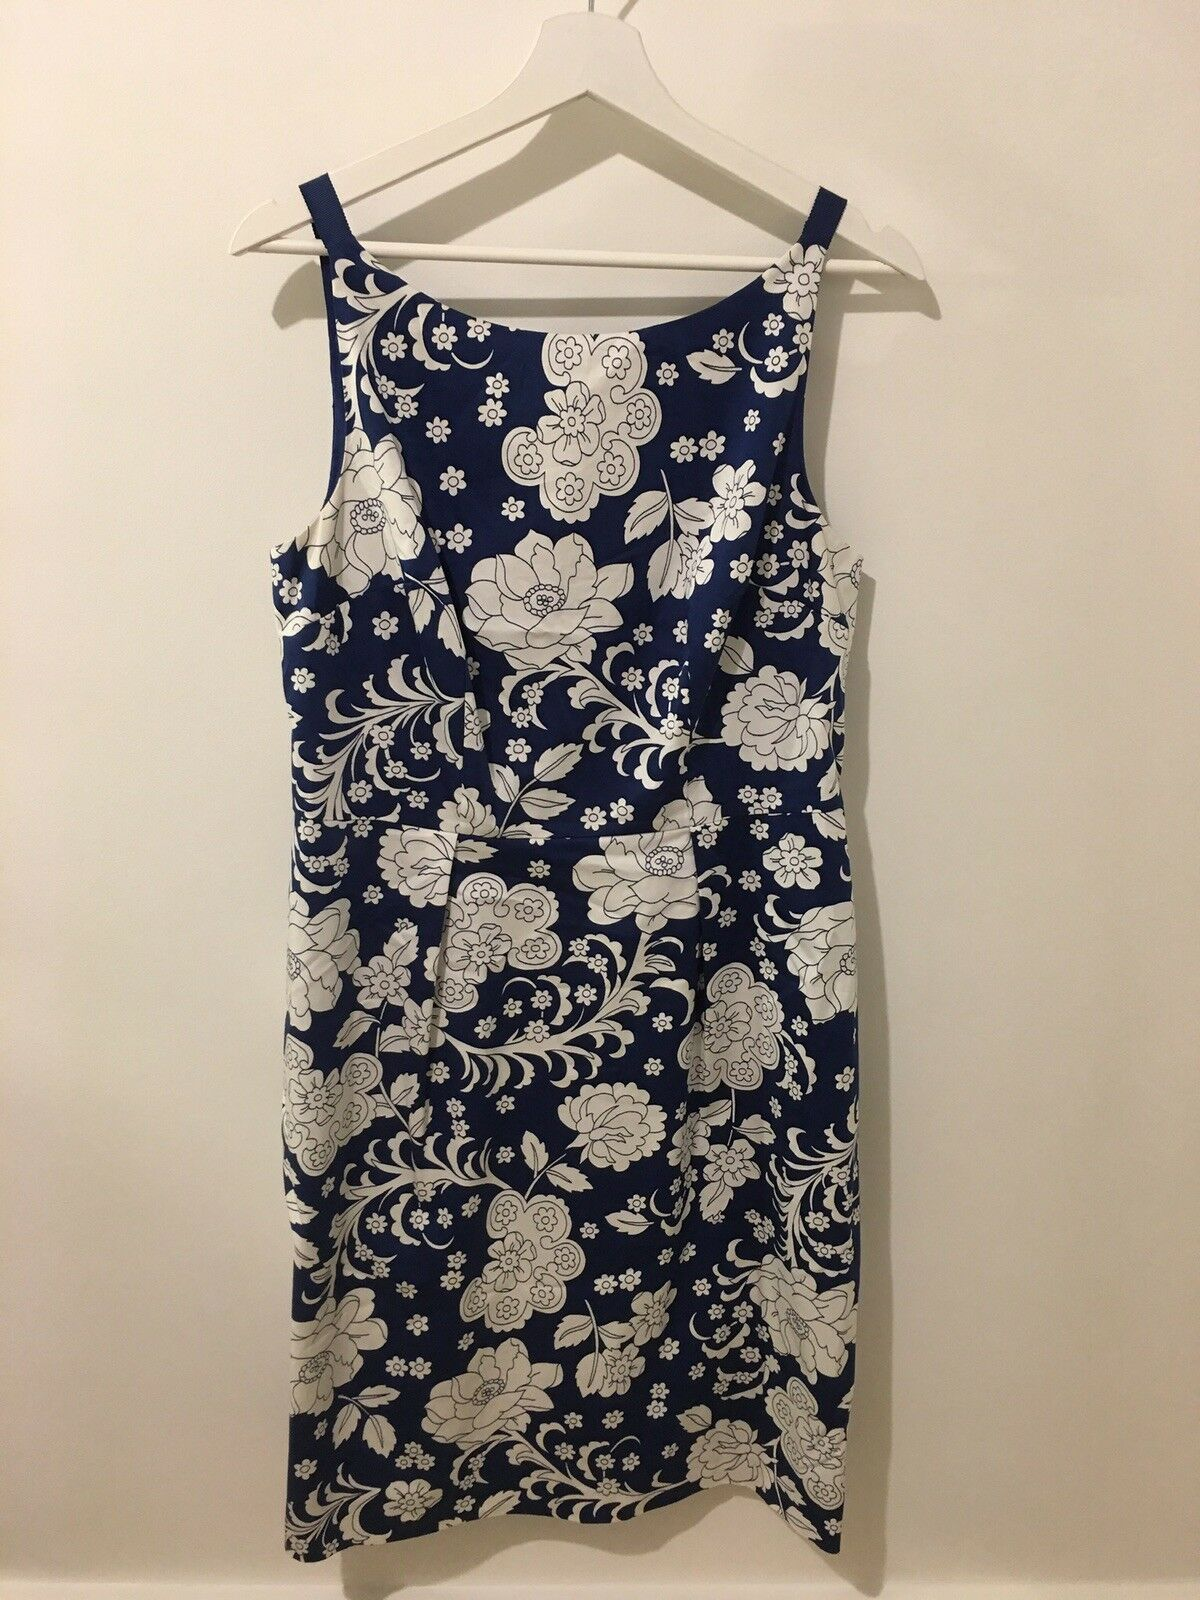 28db5f816306b Boden Summer Dress Euc 12R nwouun24912-Dresses - www.haslingdensixth.com